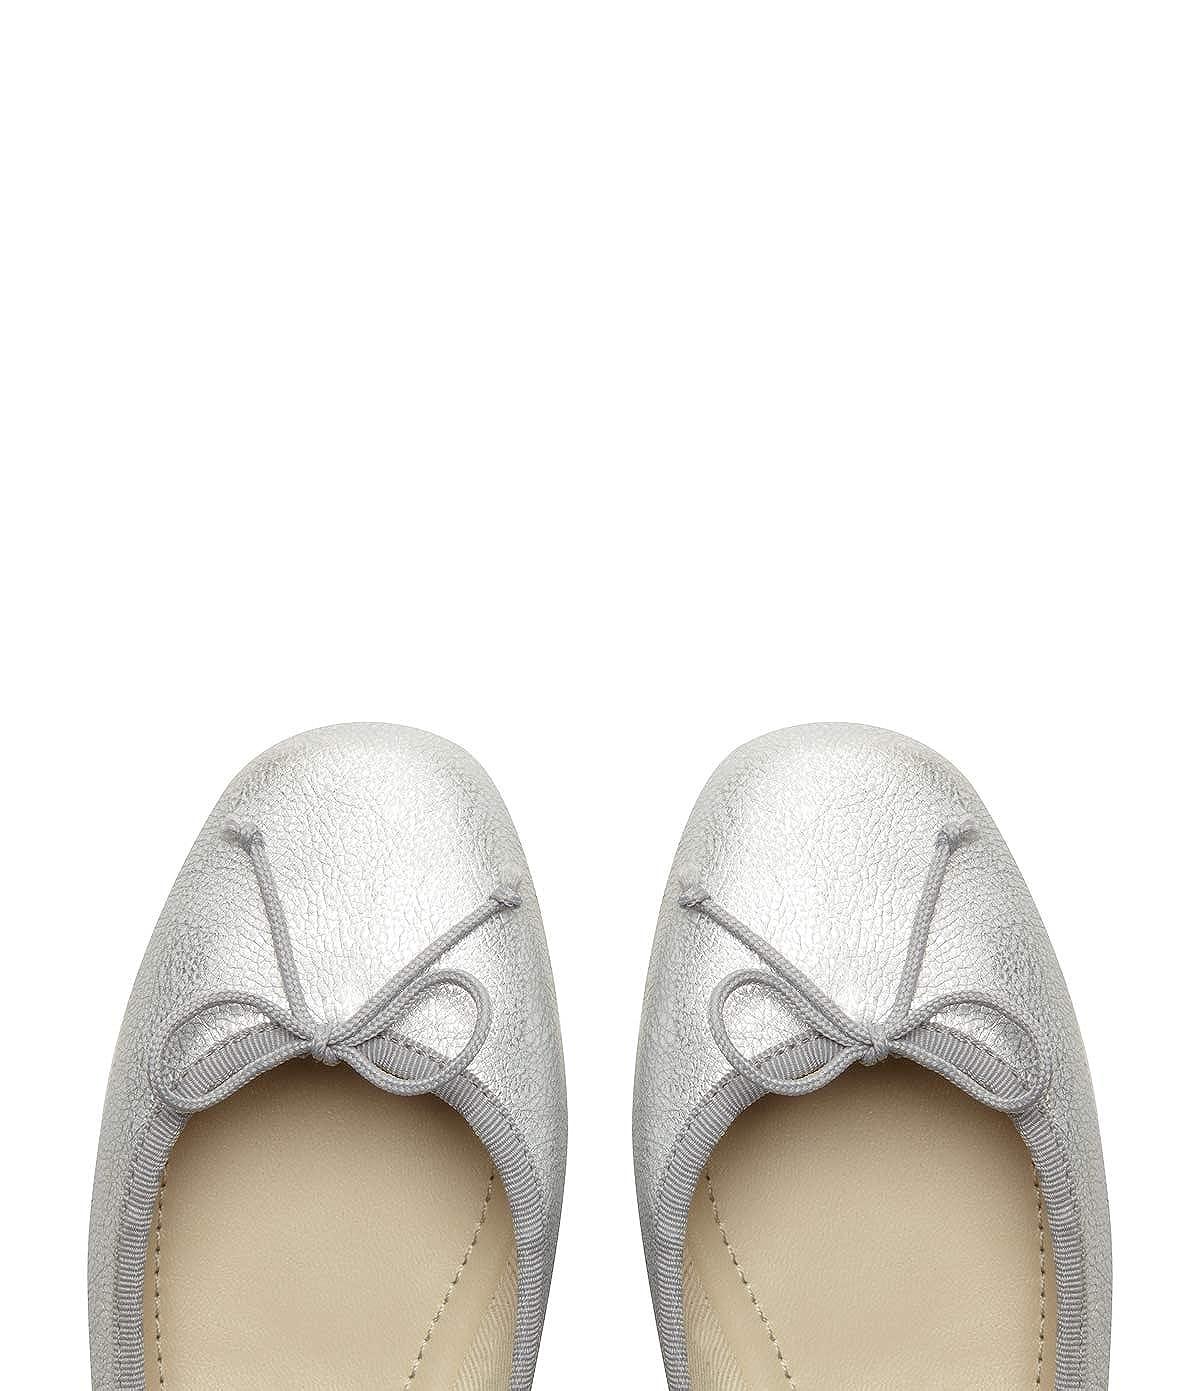 Poi Lei Damen-Schuhe Klassische Leder Ballerinas Bonita Silber Flach Leder Klassische 6d6faf